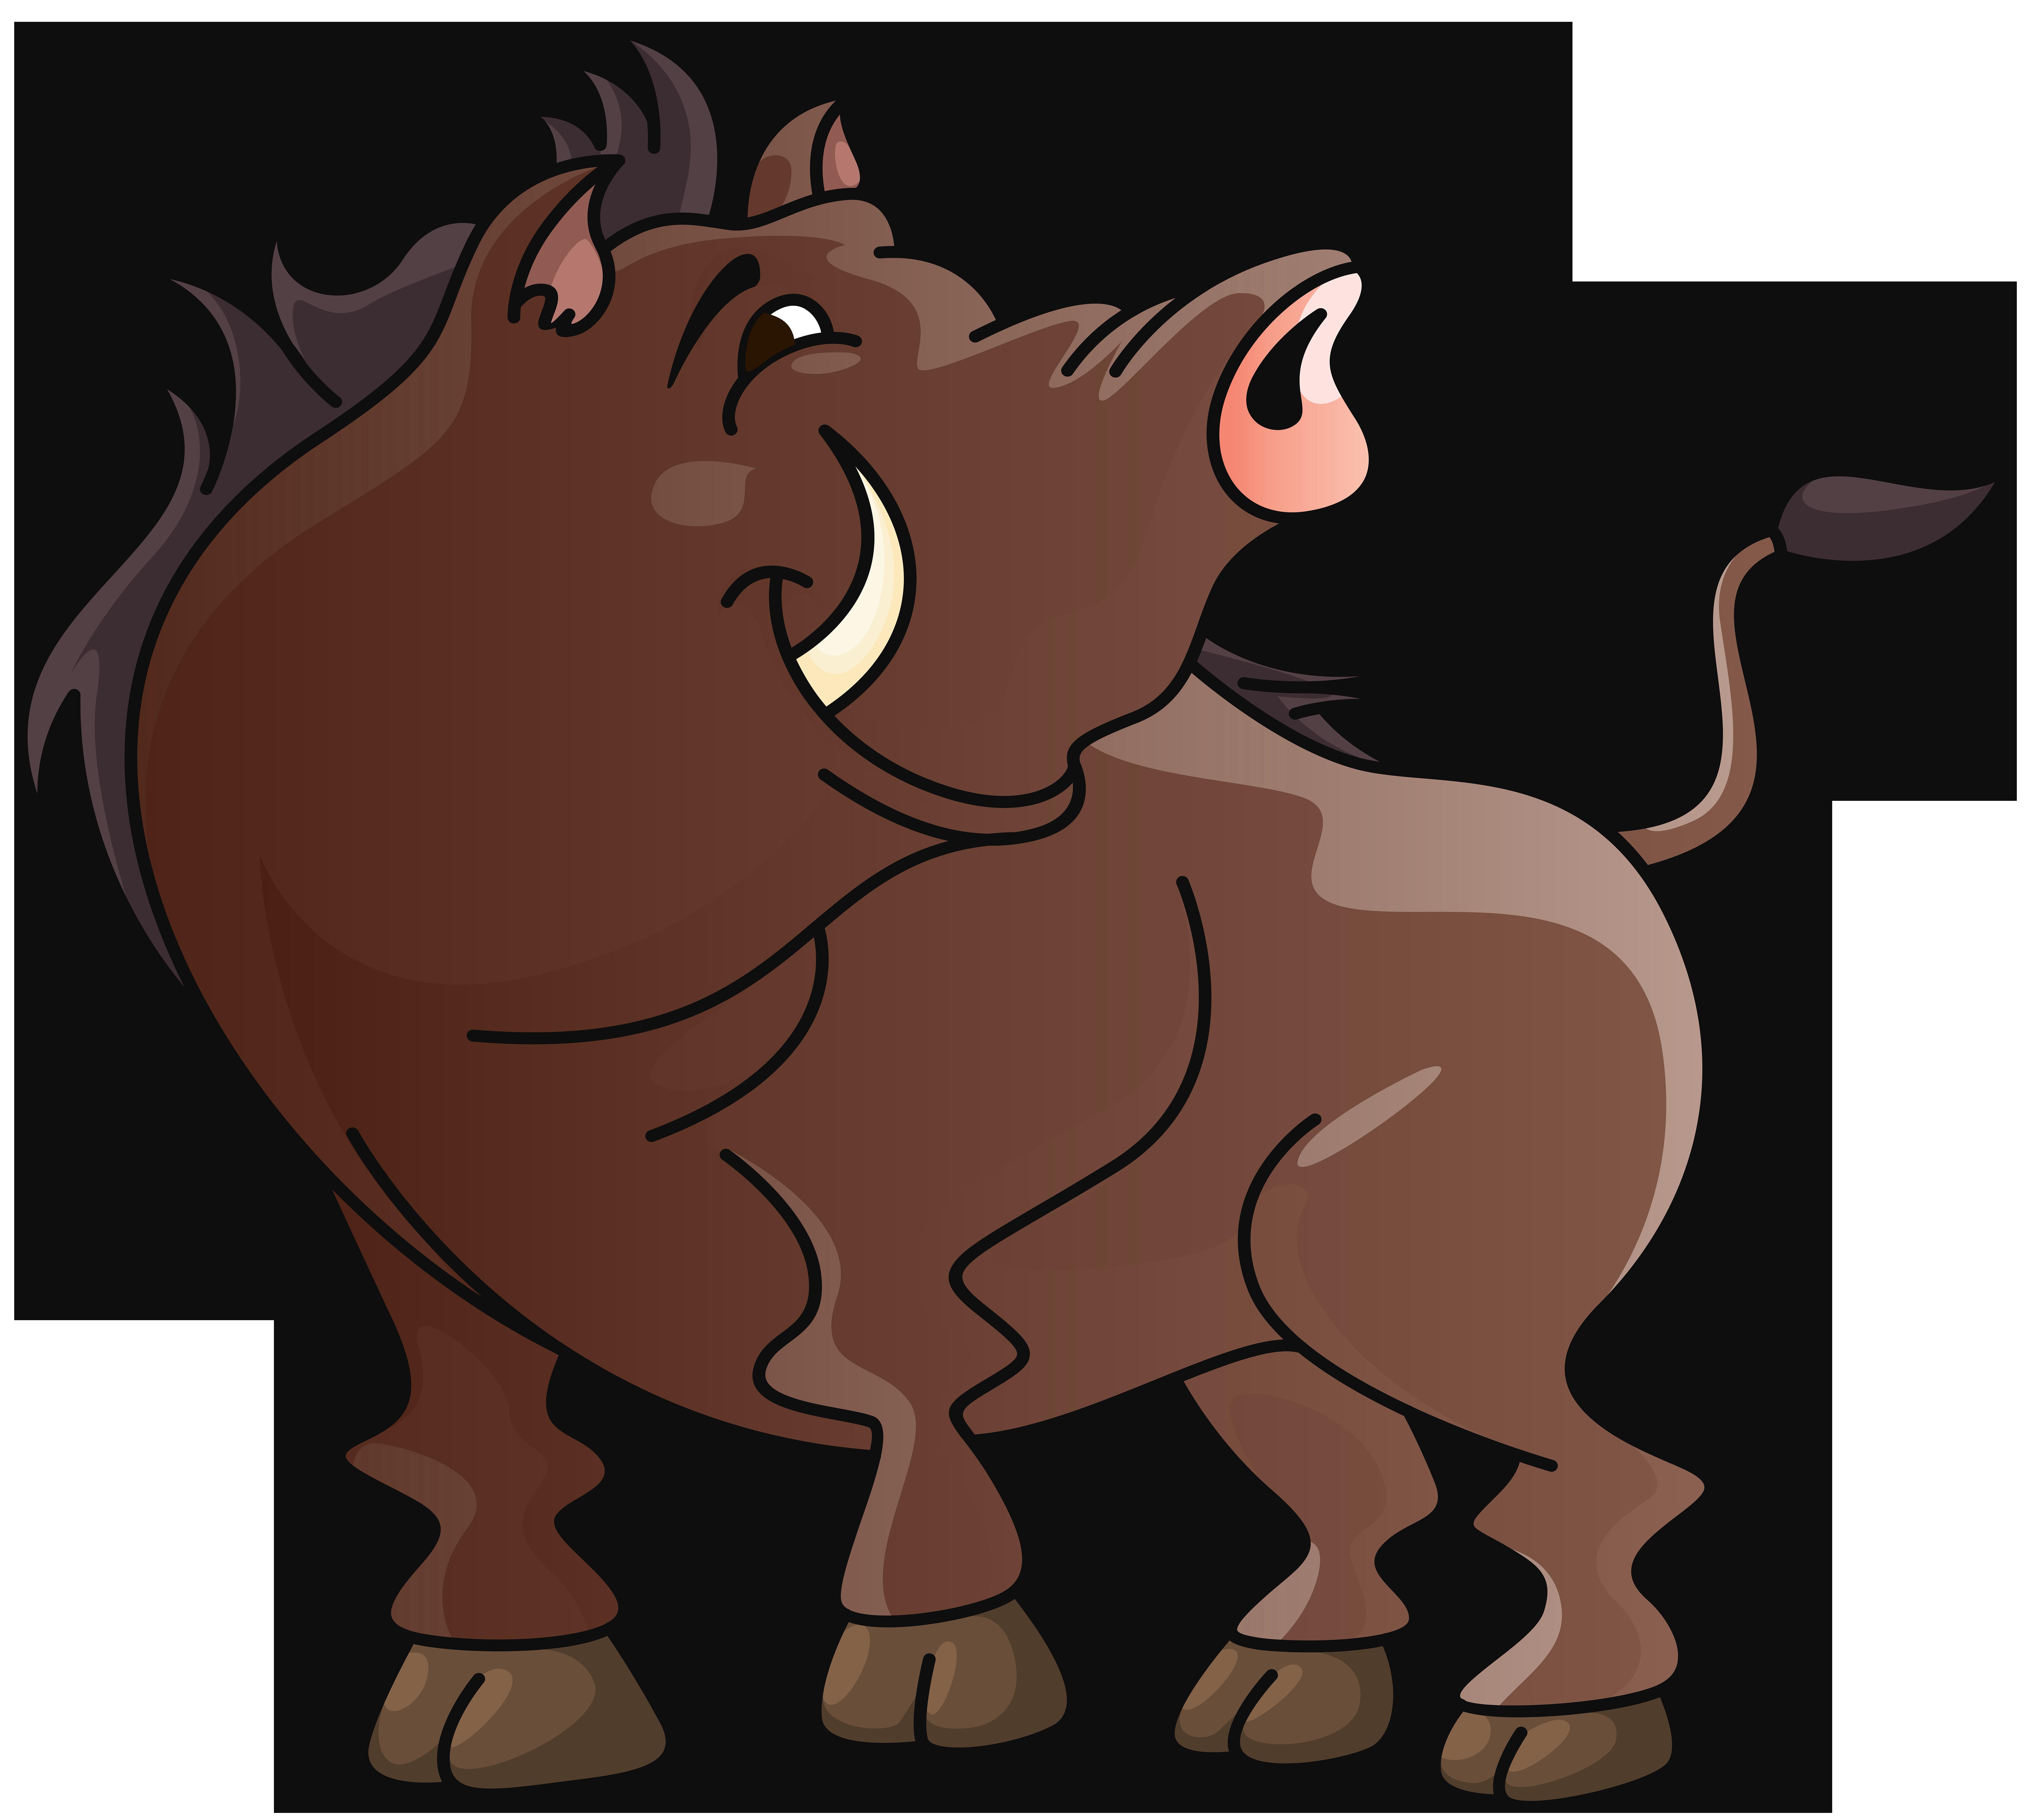 Boar Cartoon PNG Clipart Image.